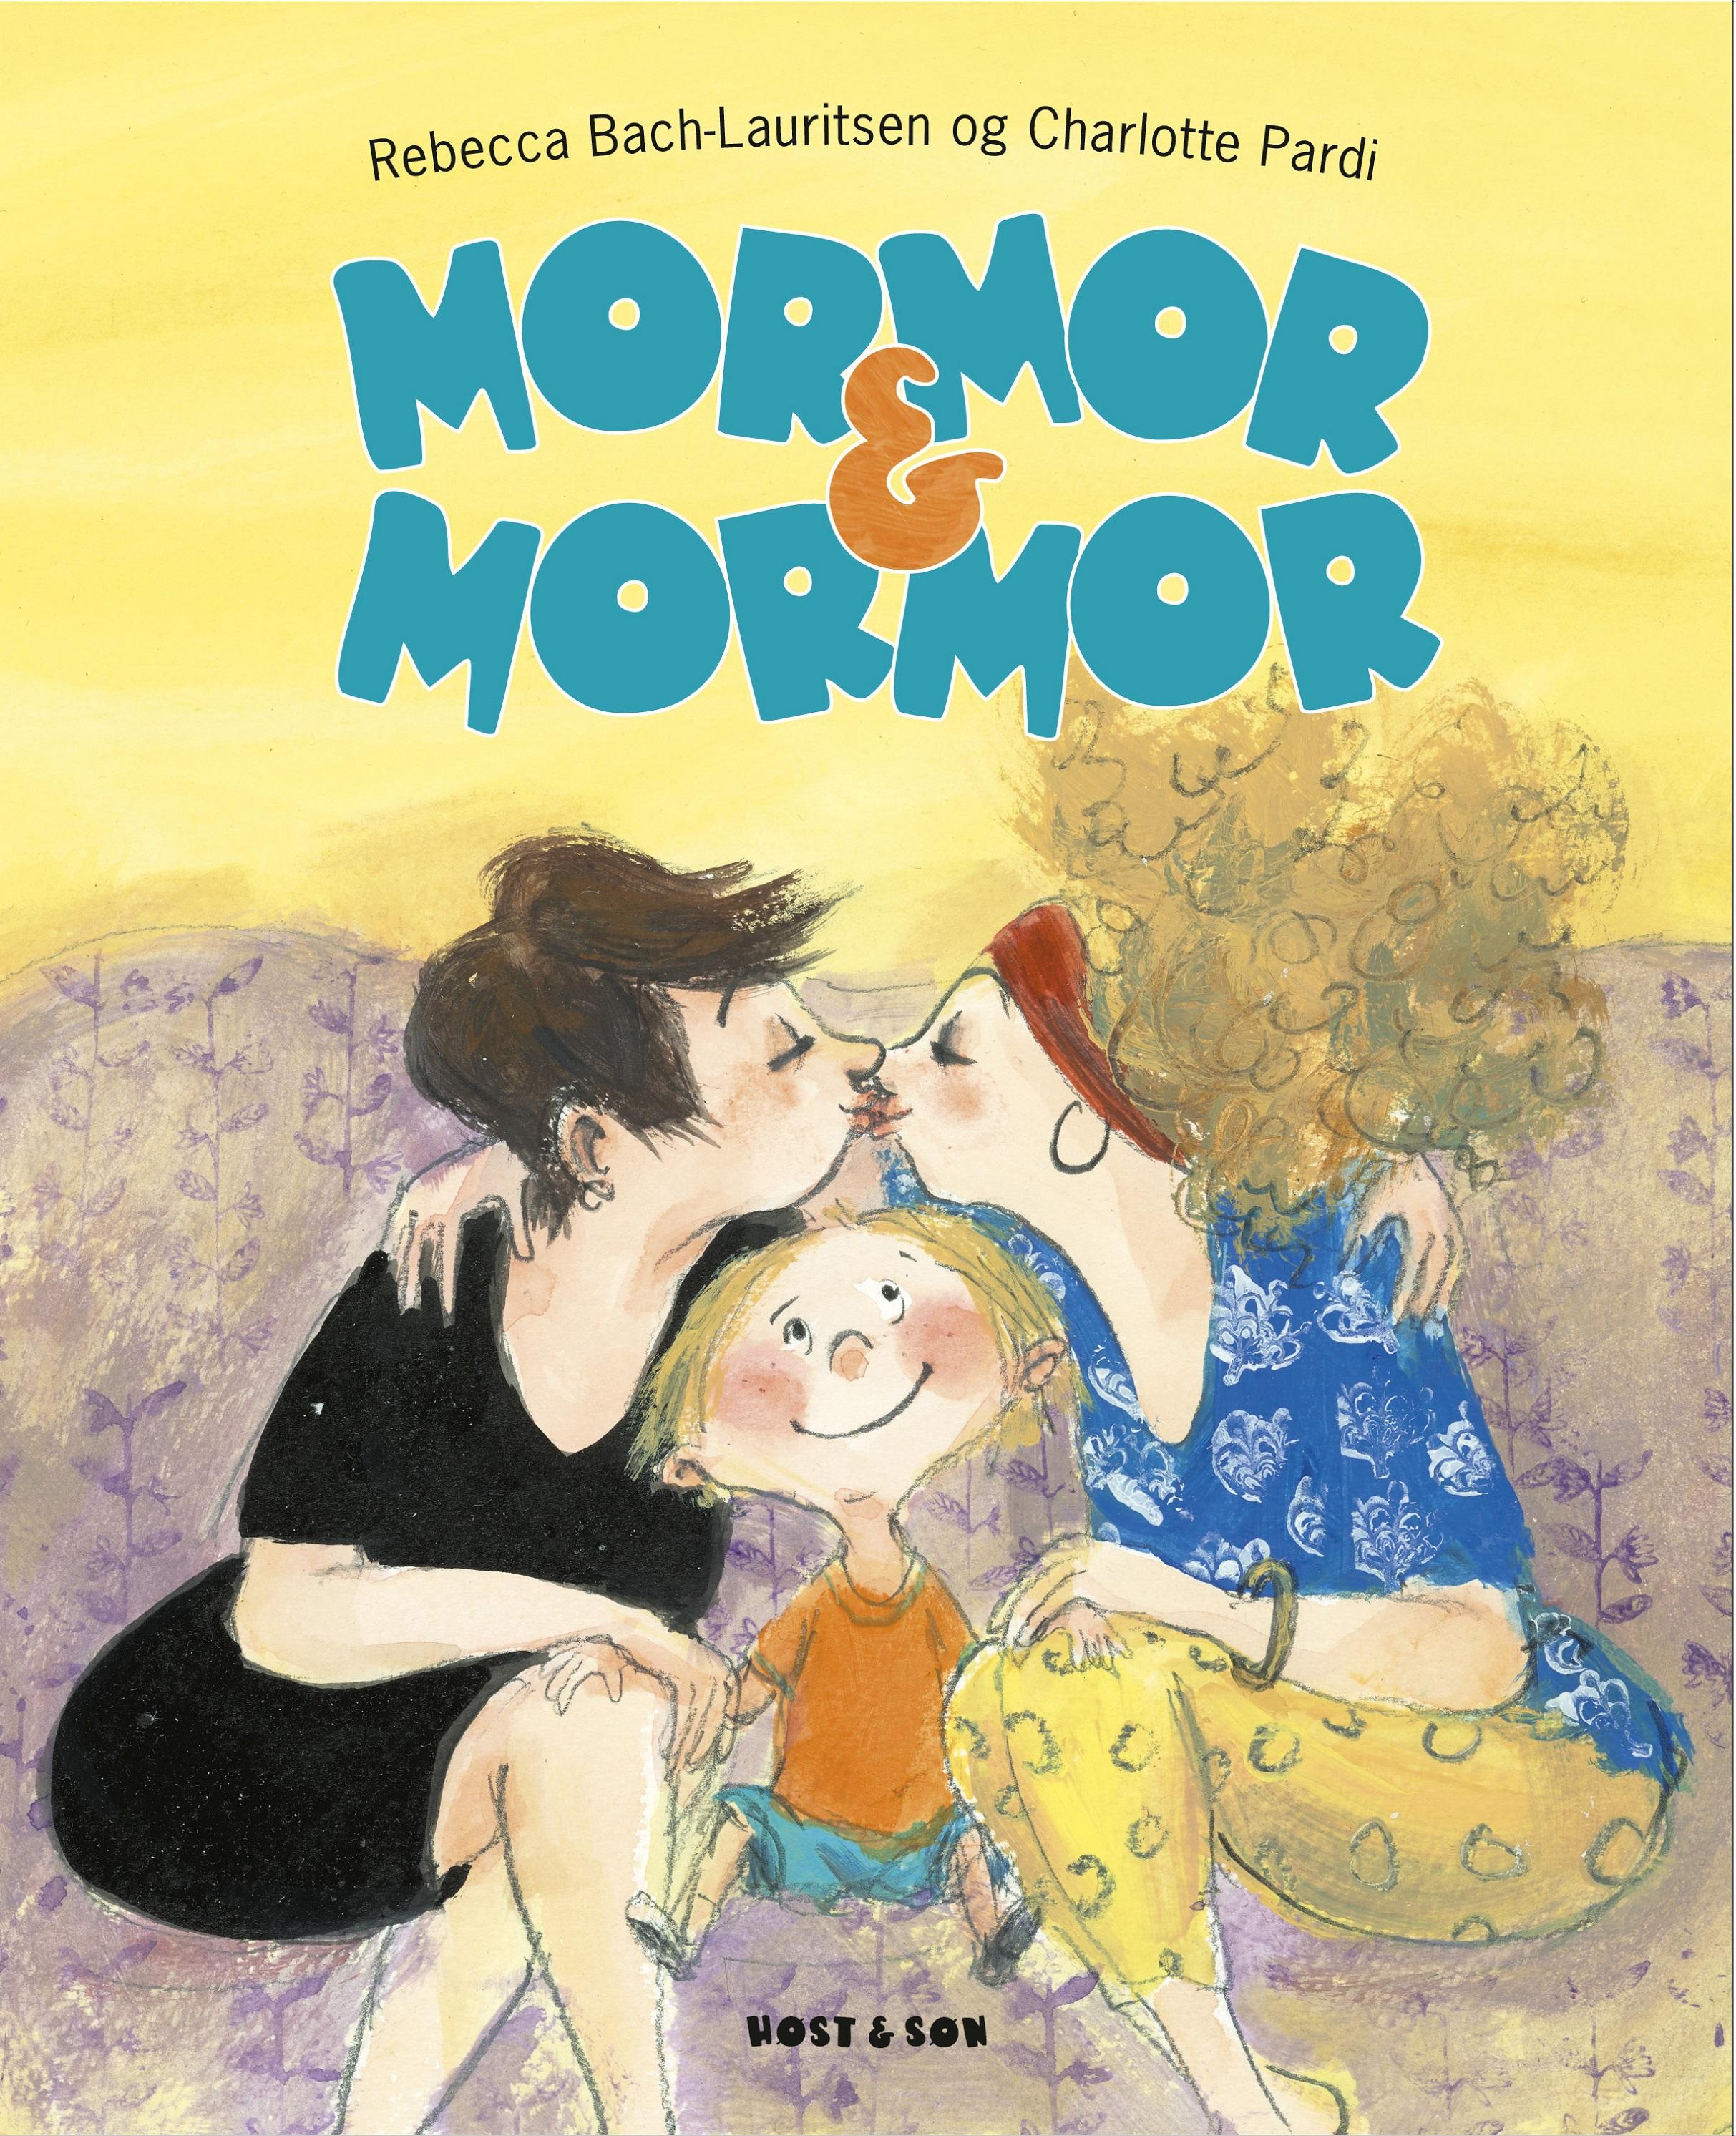 Mormor & Mormor - Rebecca Bach-Lauritsen - Bøger - Høst og Søn - 9788763865517 - 18/8-2020